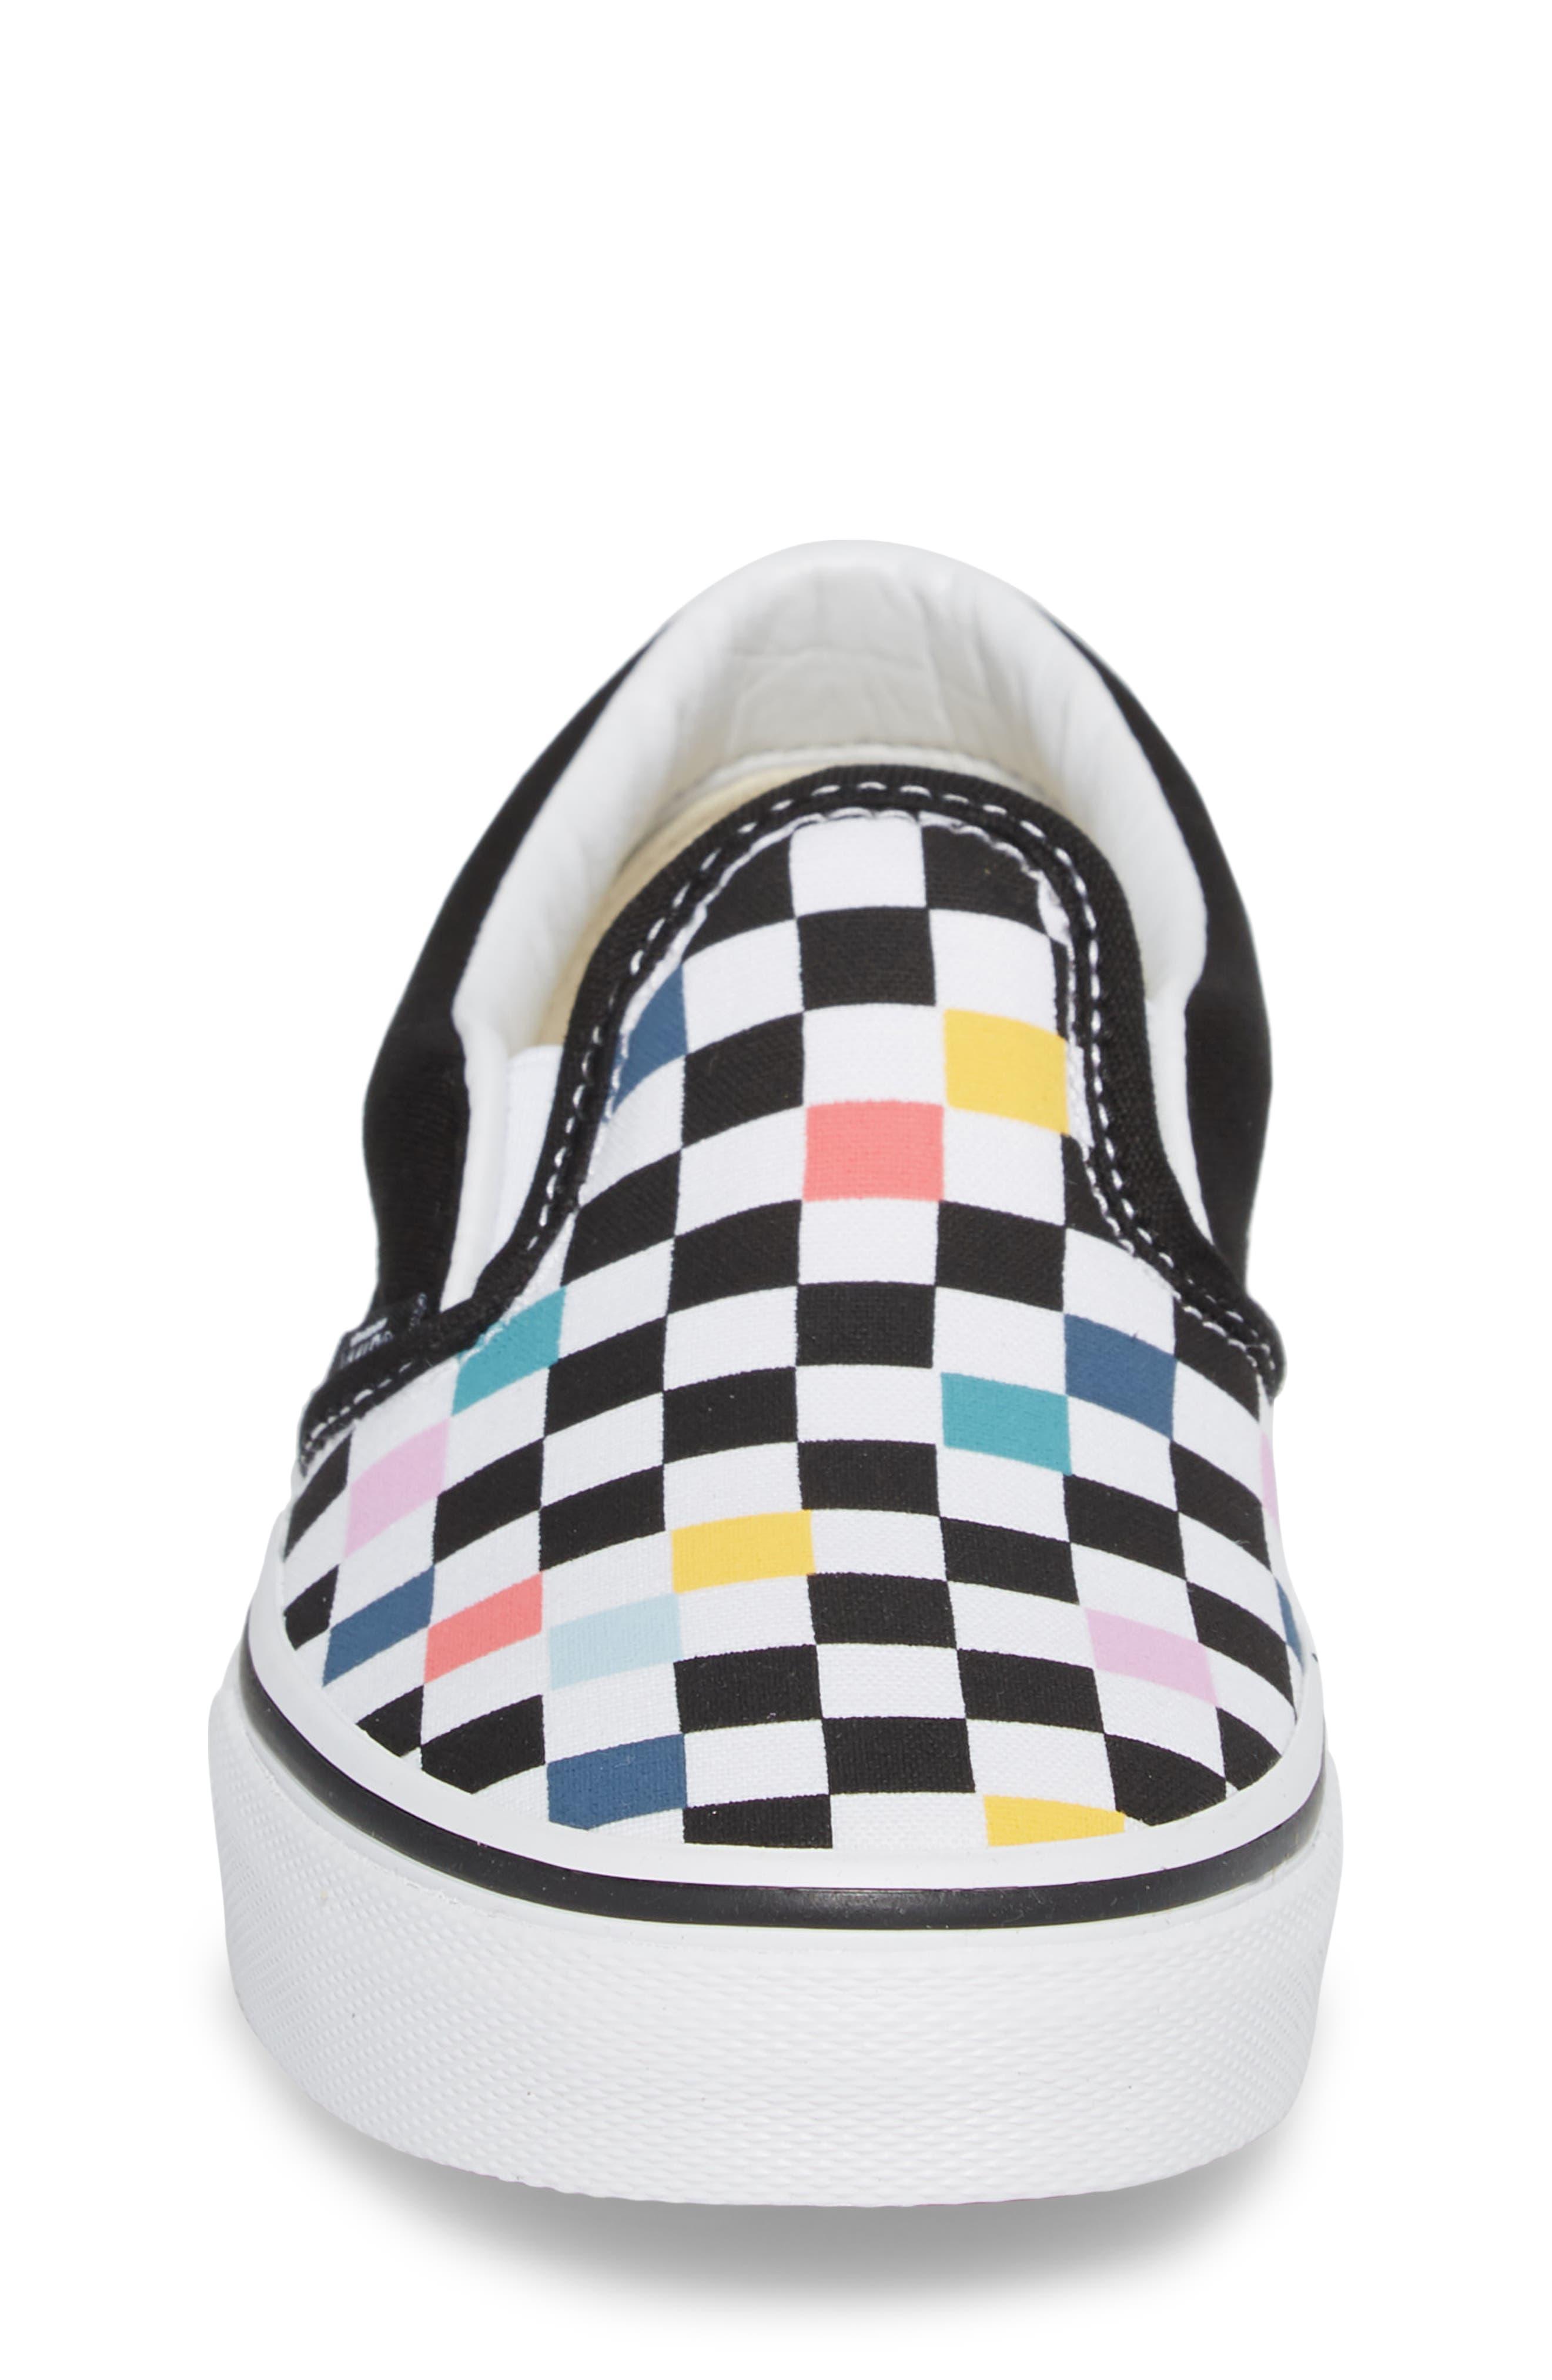 Party Check Slip-On Sneaker,                             Alternate thumbnail 4, color,                             001